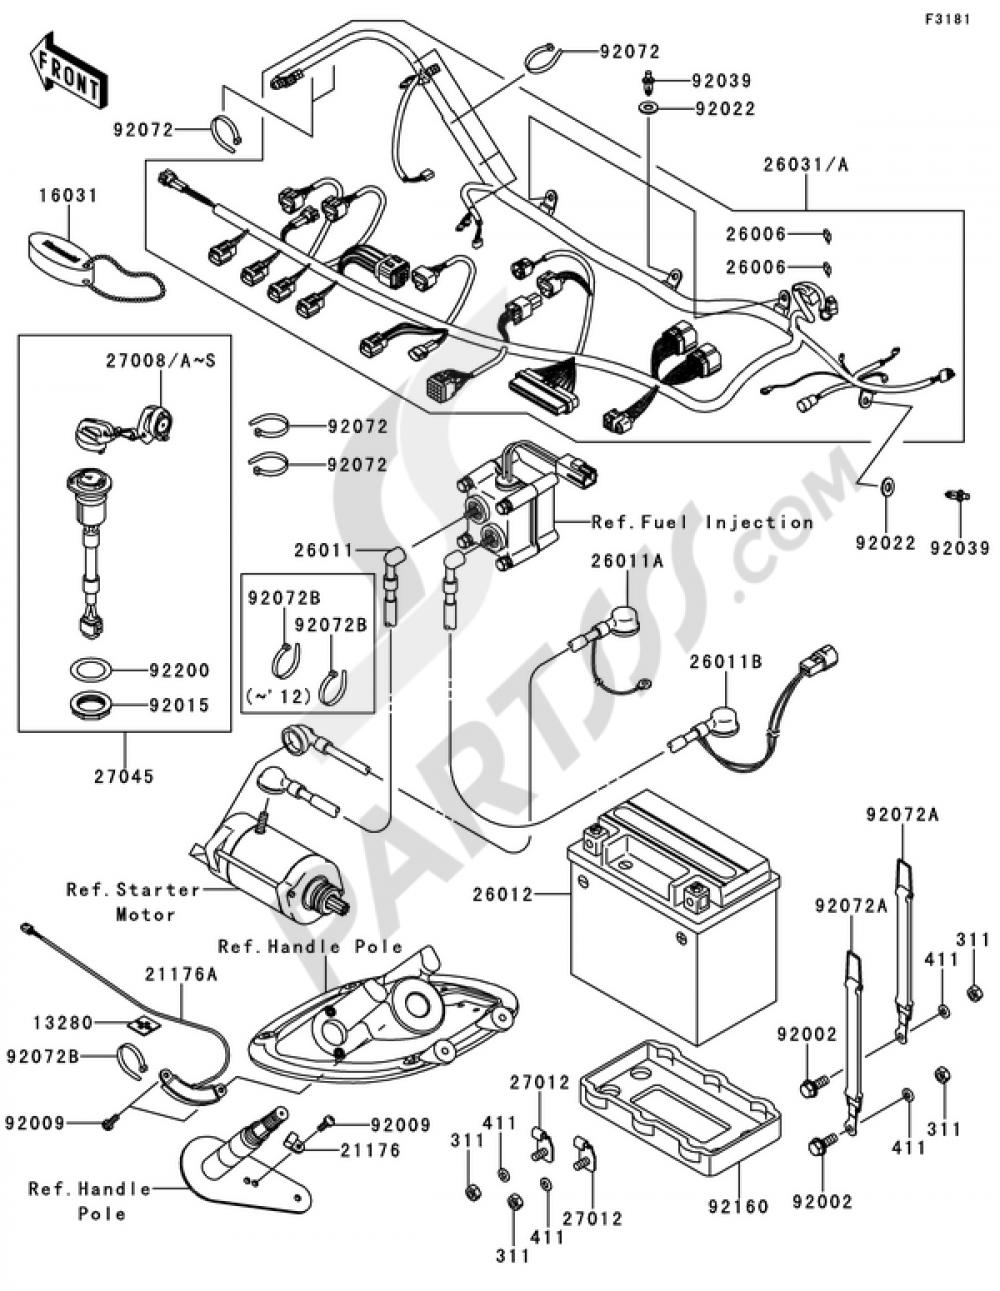 Kawasaki Stx 15f Wiring Diagram Electrical Diagrams 1100 Equipment1 2abf Aef Jet Ski 2014